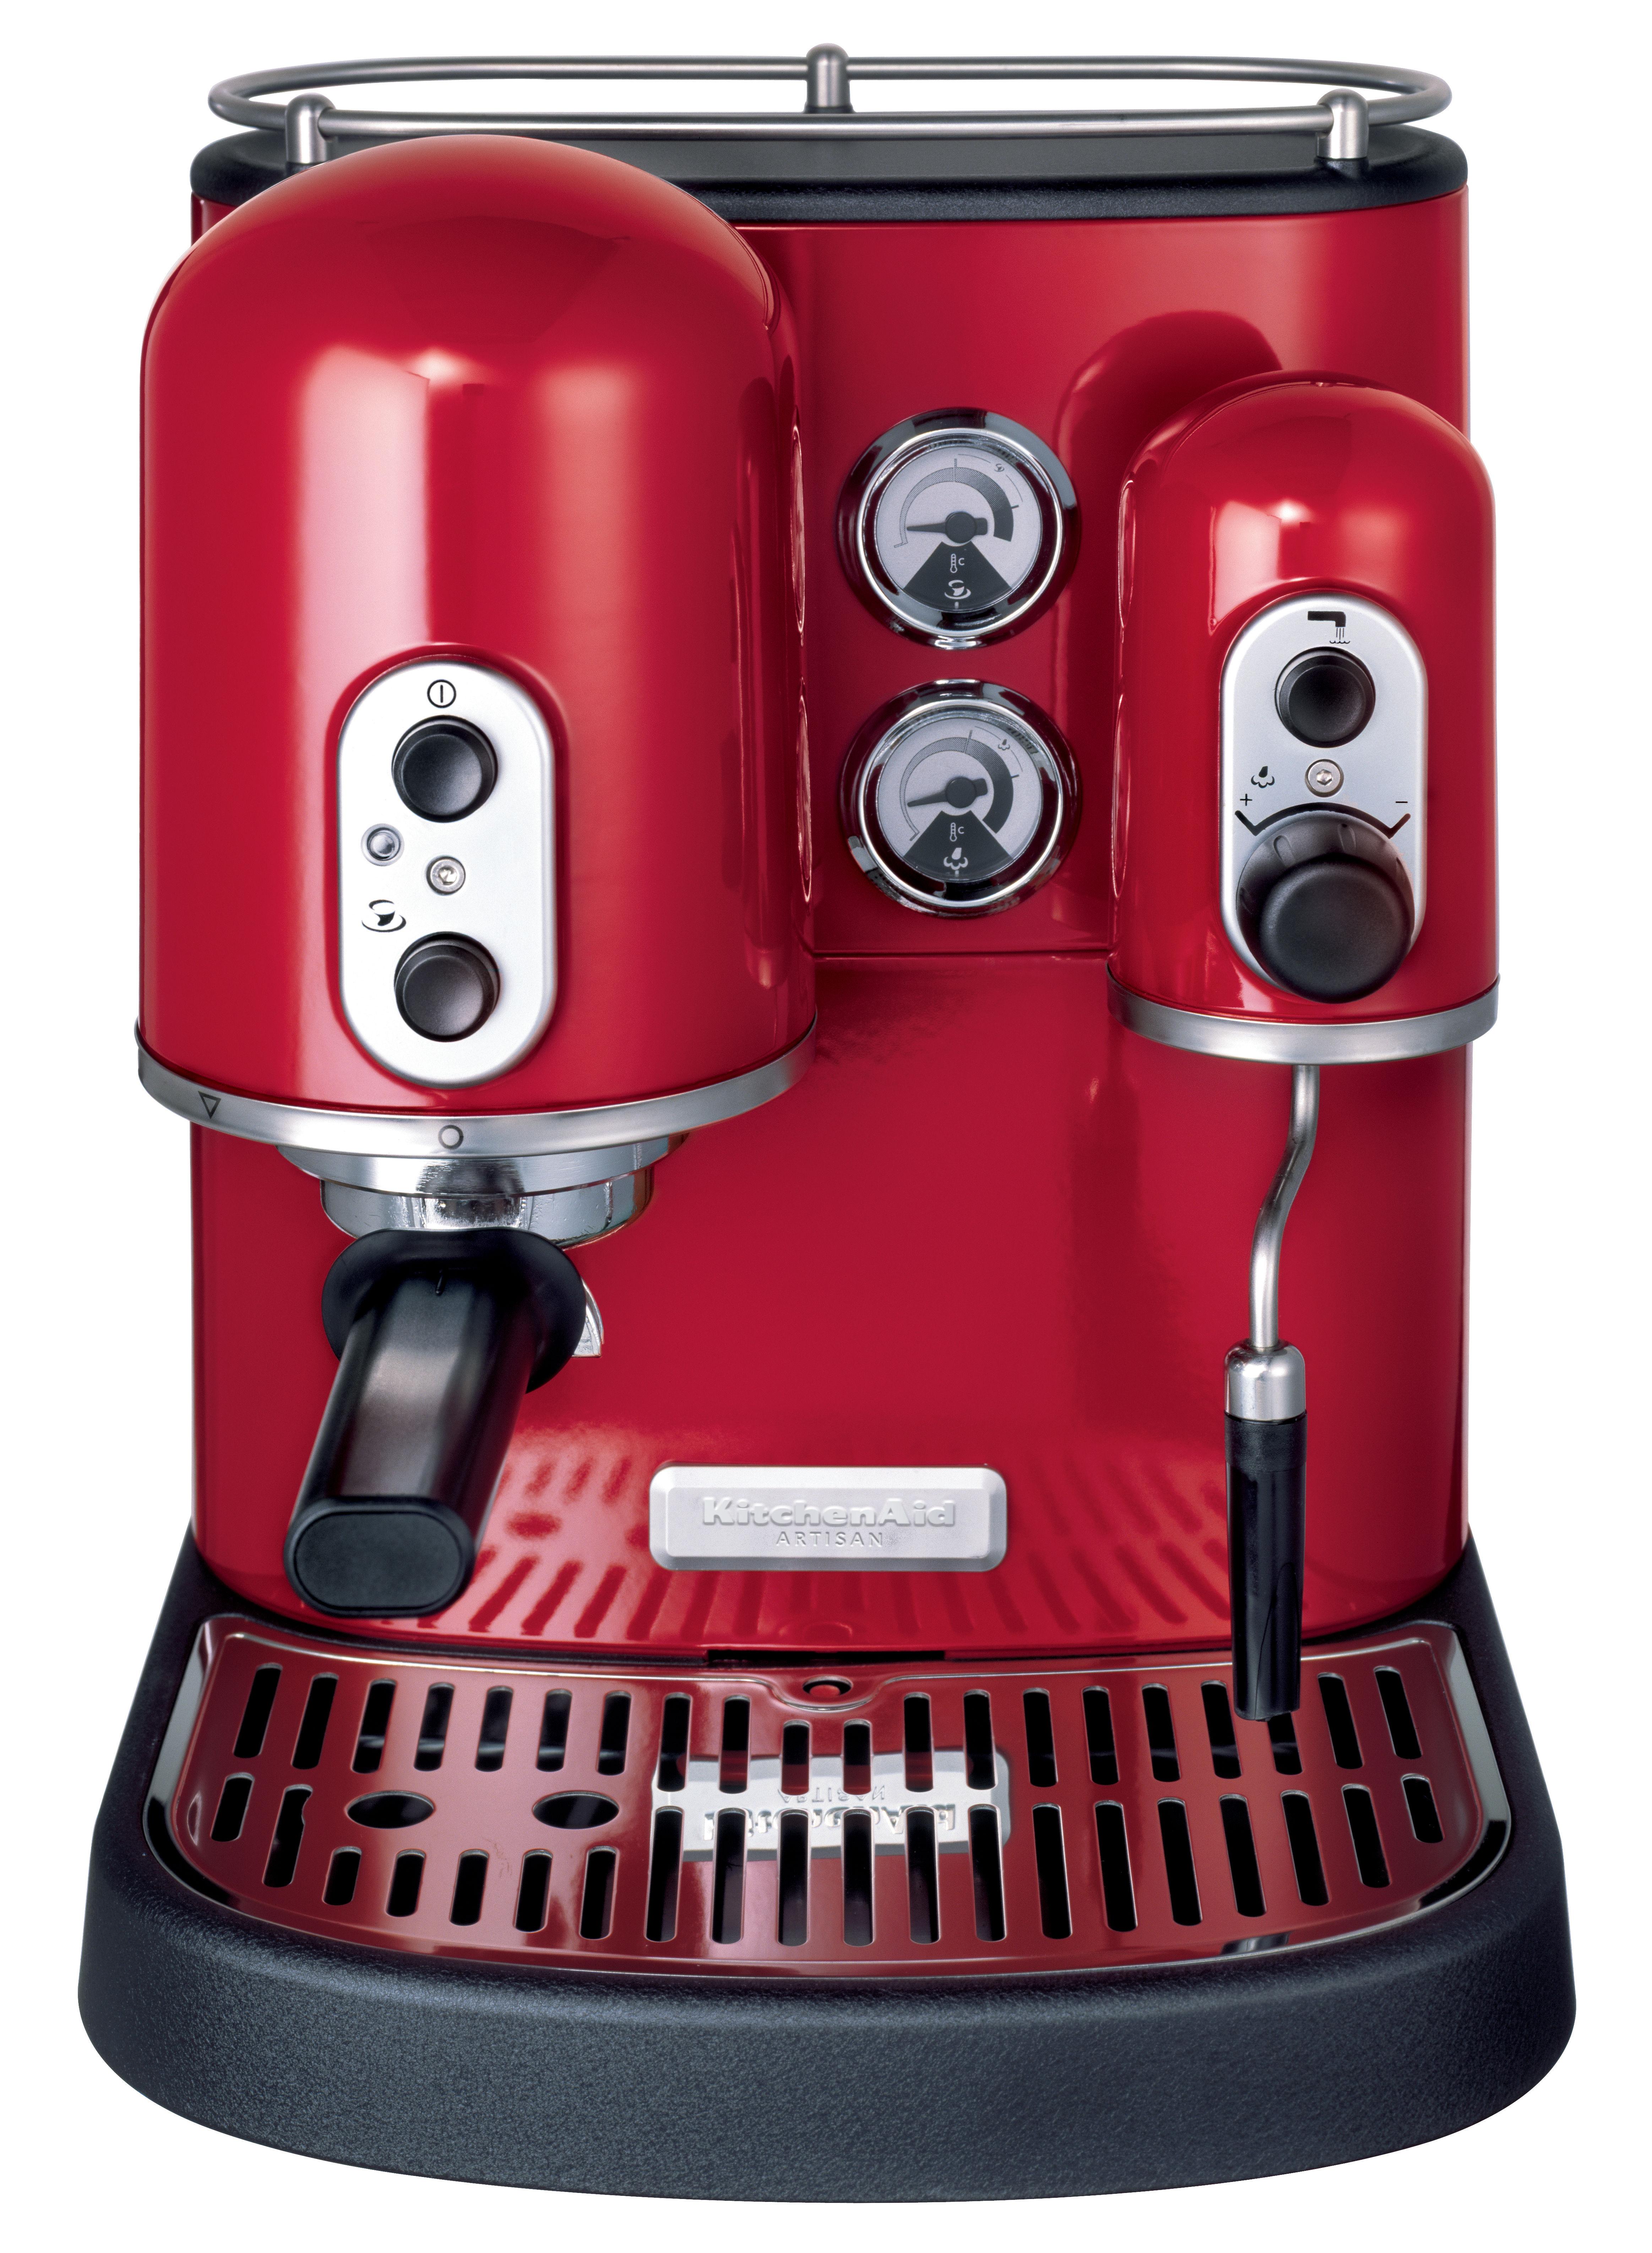 cafeti re expresso artisan pour dosettes et caf moulu rouge empire kitchenaid. Black Bedroom Furniture Sets. Home Design Ideas